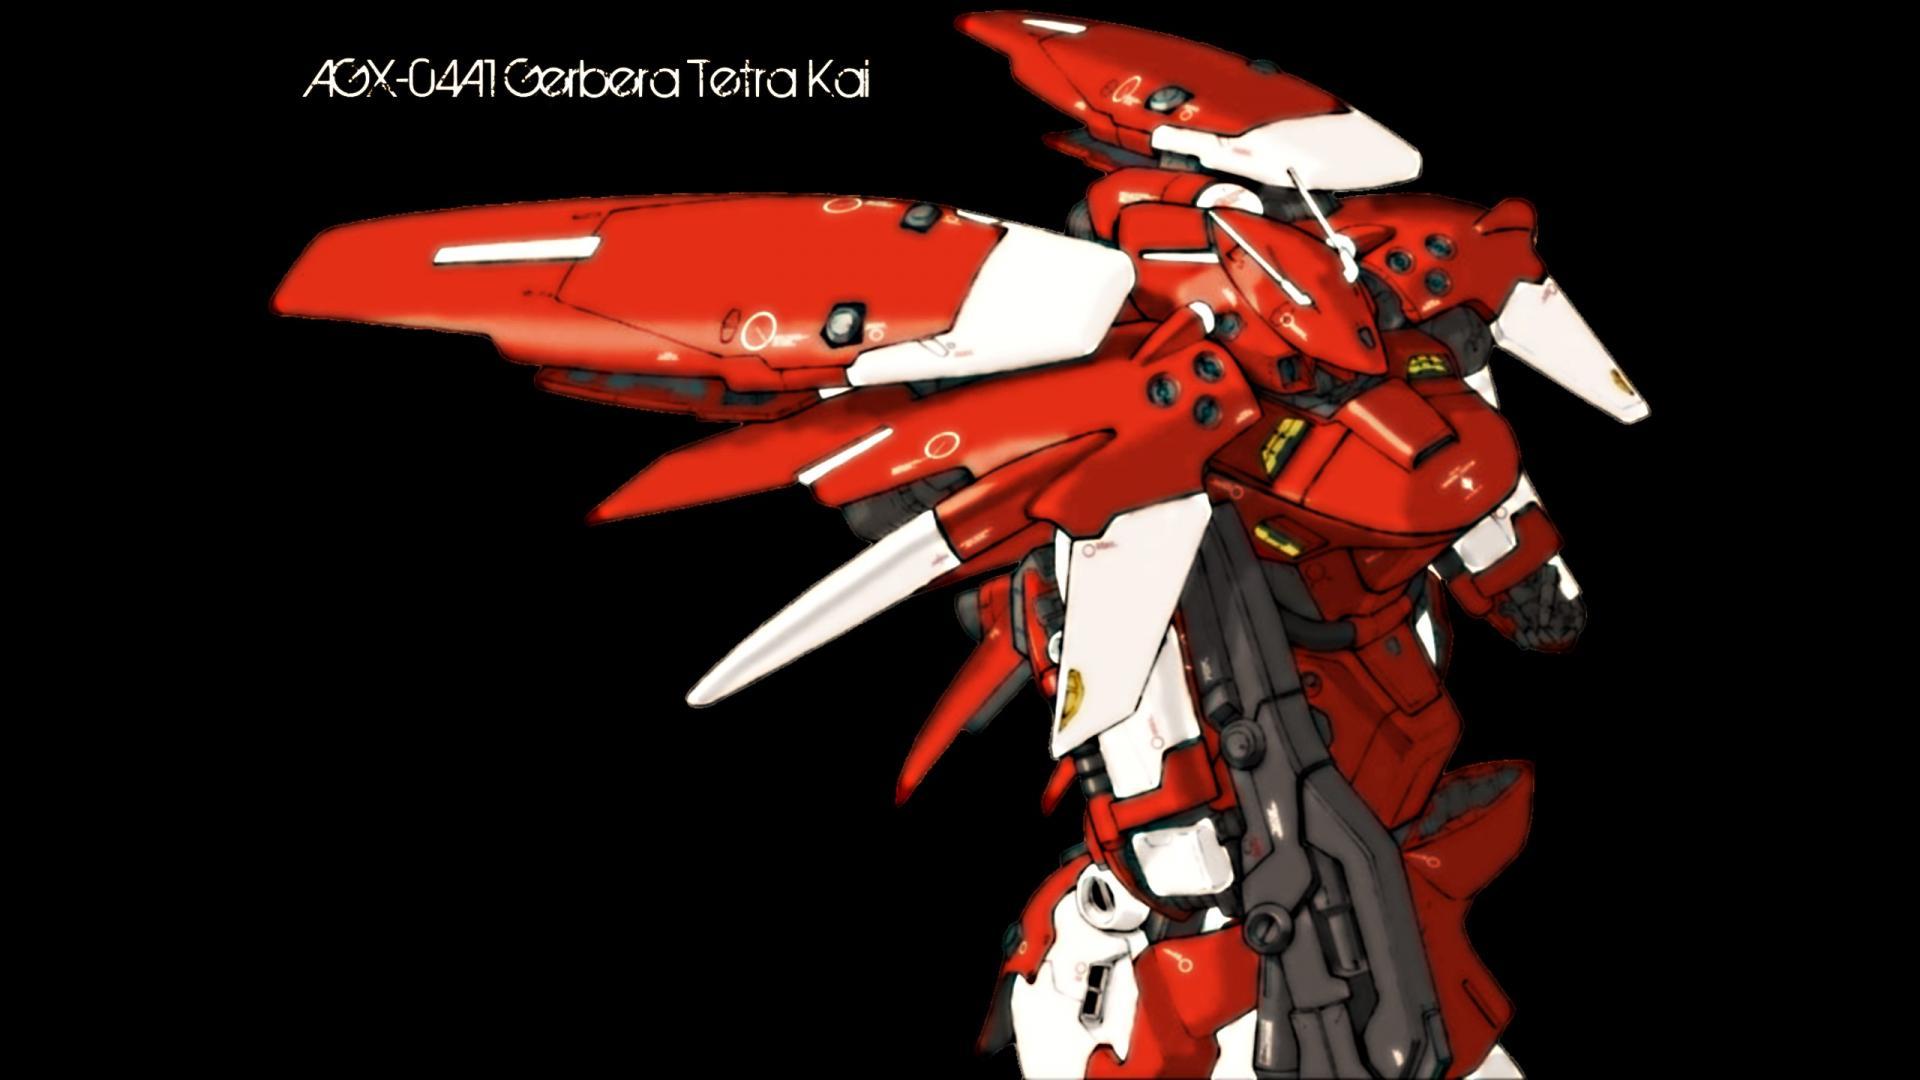 Gundam 0083 stardust memory agx 04a1 gerbera tetra kai wallpaper 1920x1080